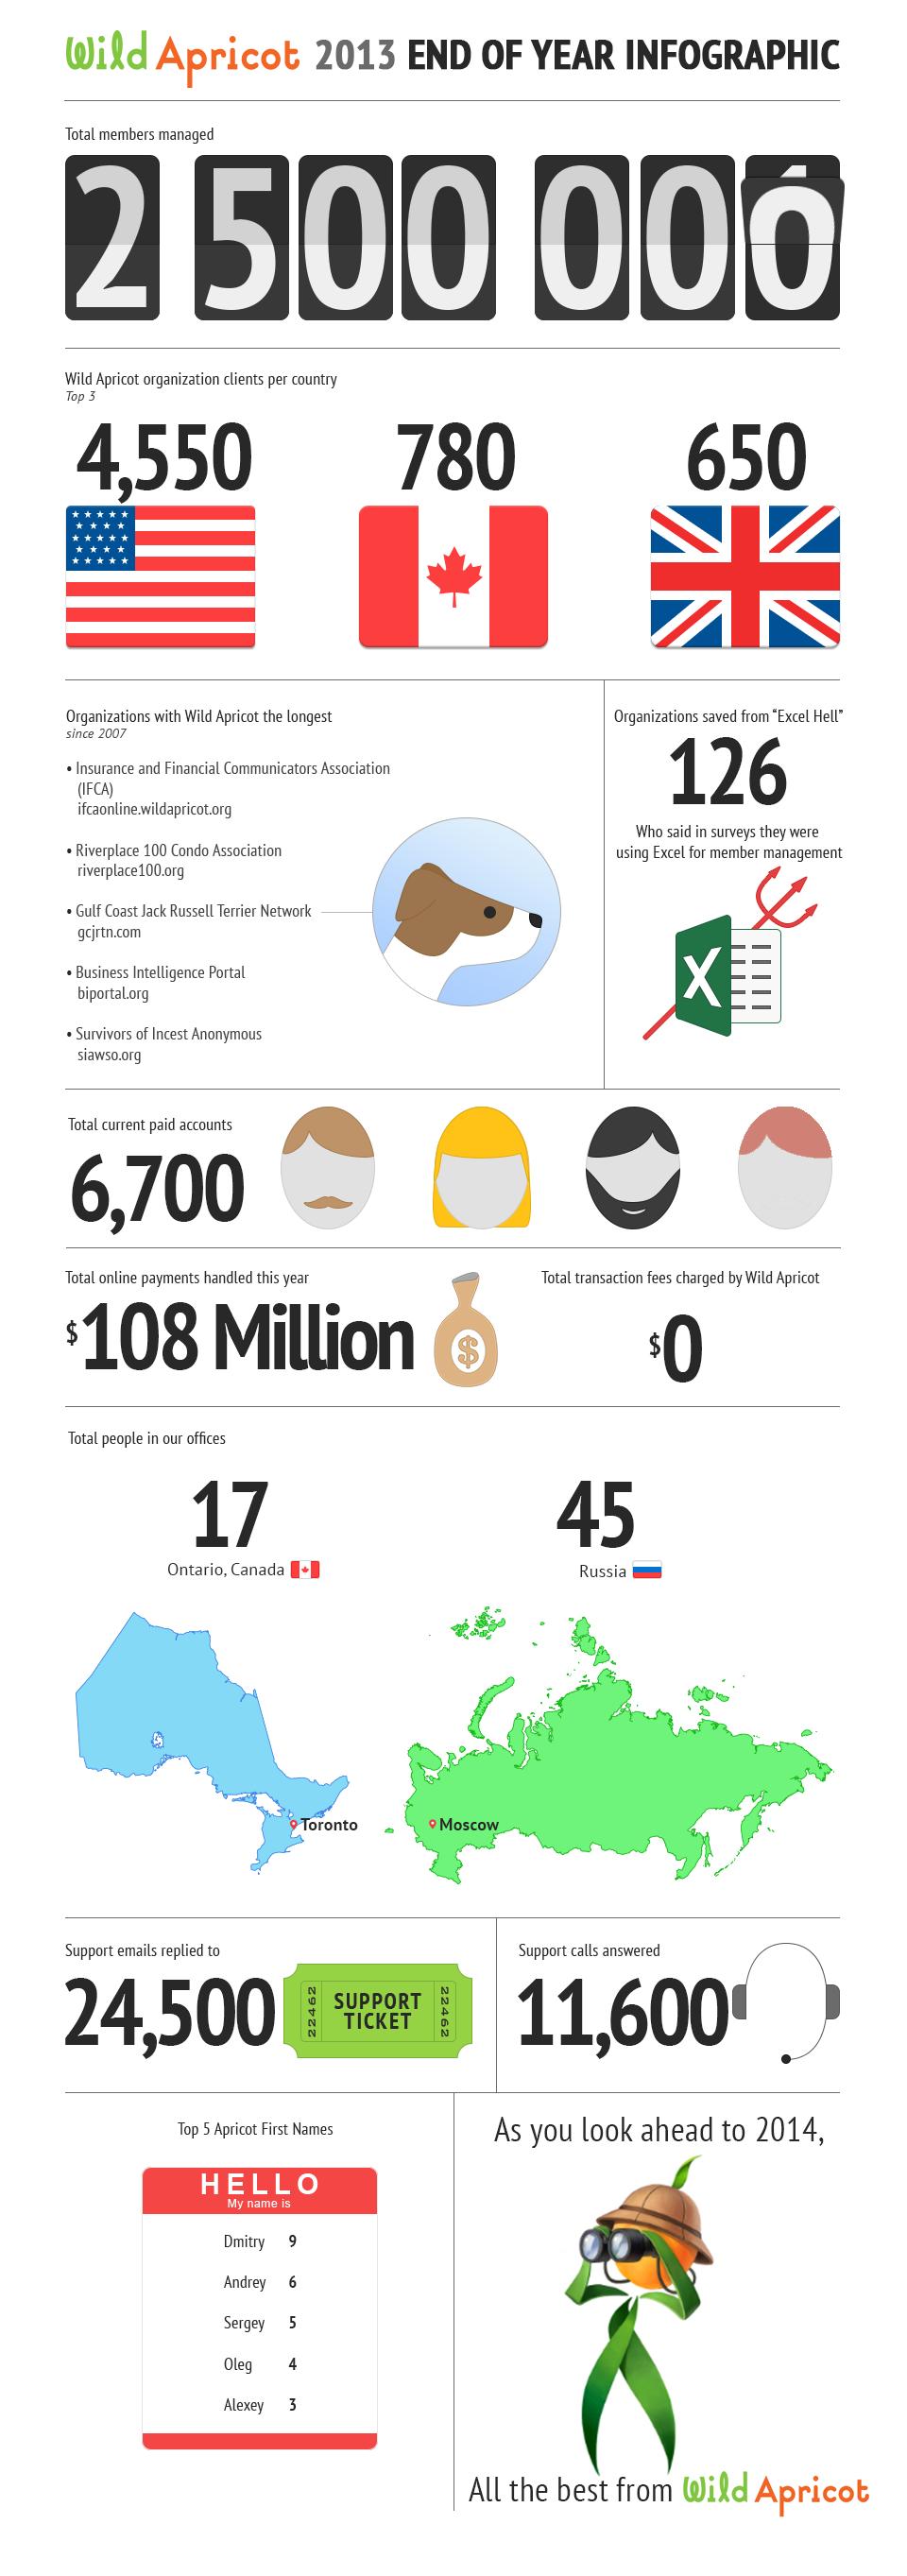 Wild Apricot 2013 Infographic